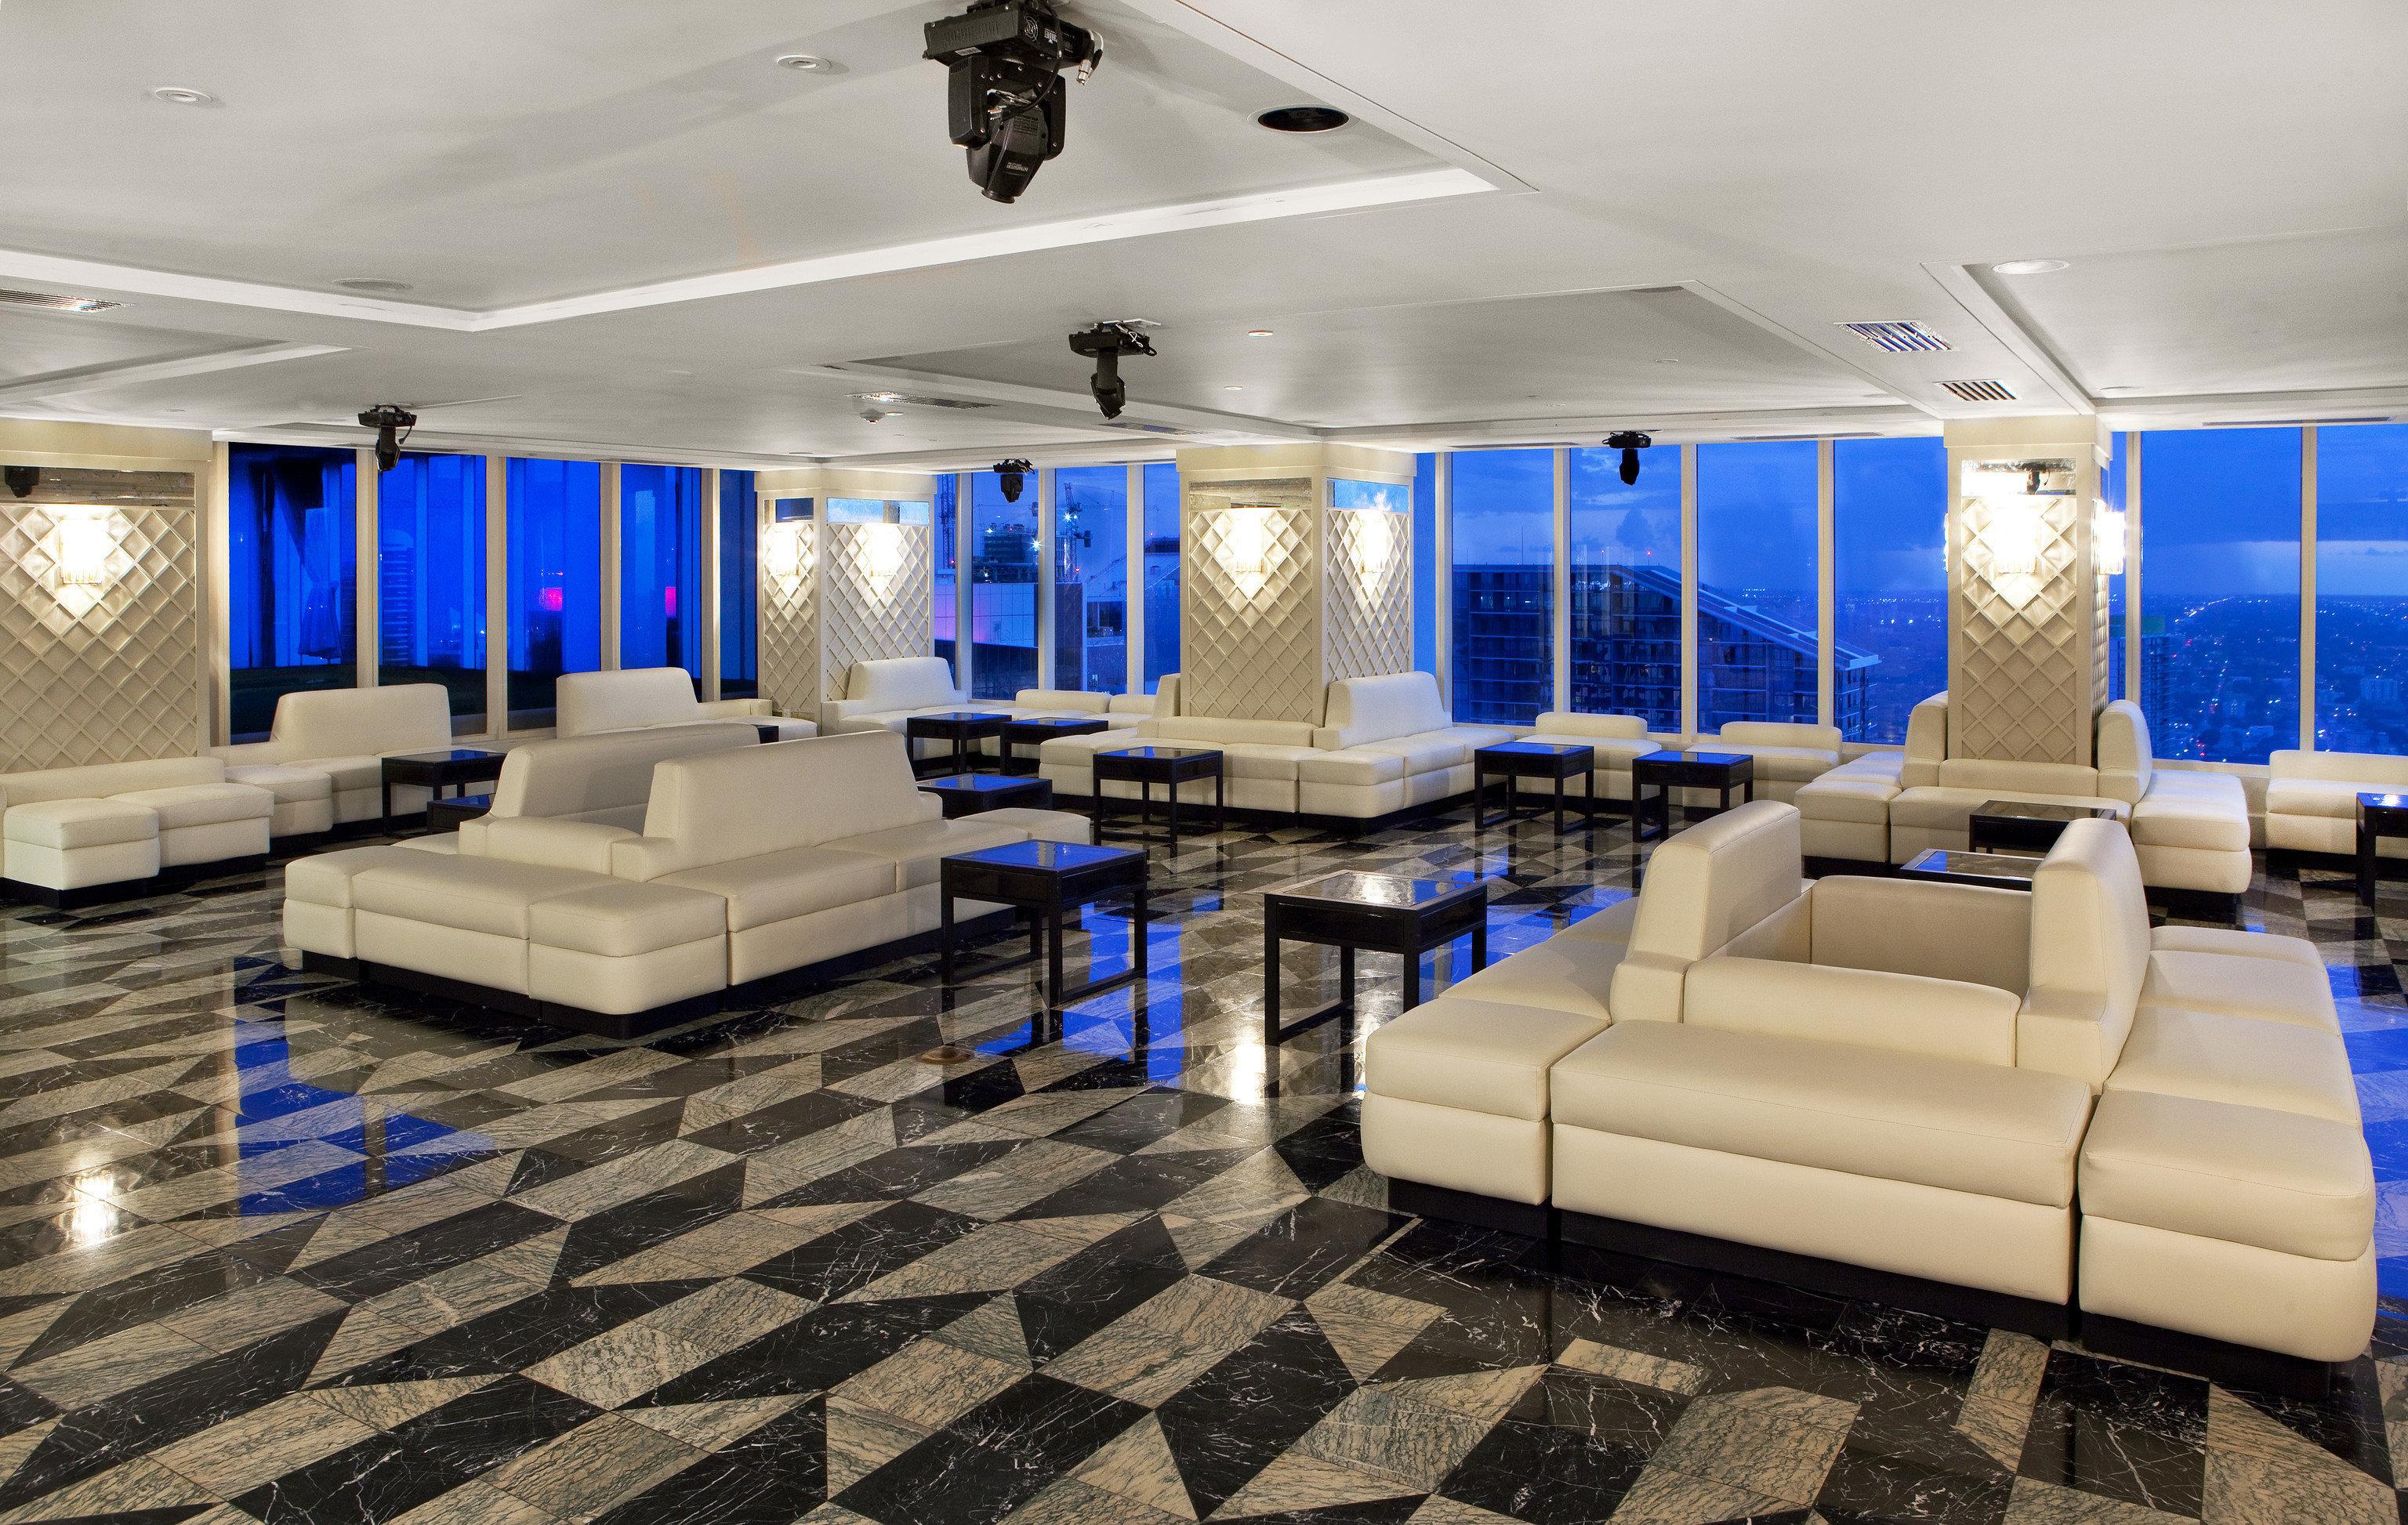 Lobby auditorium conference hall living room waiting room convention center condominium flooring yacht headquarters